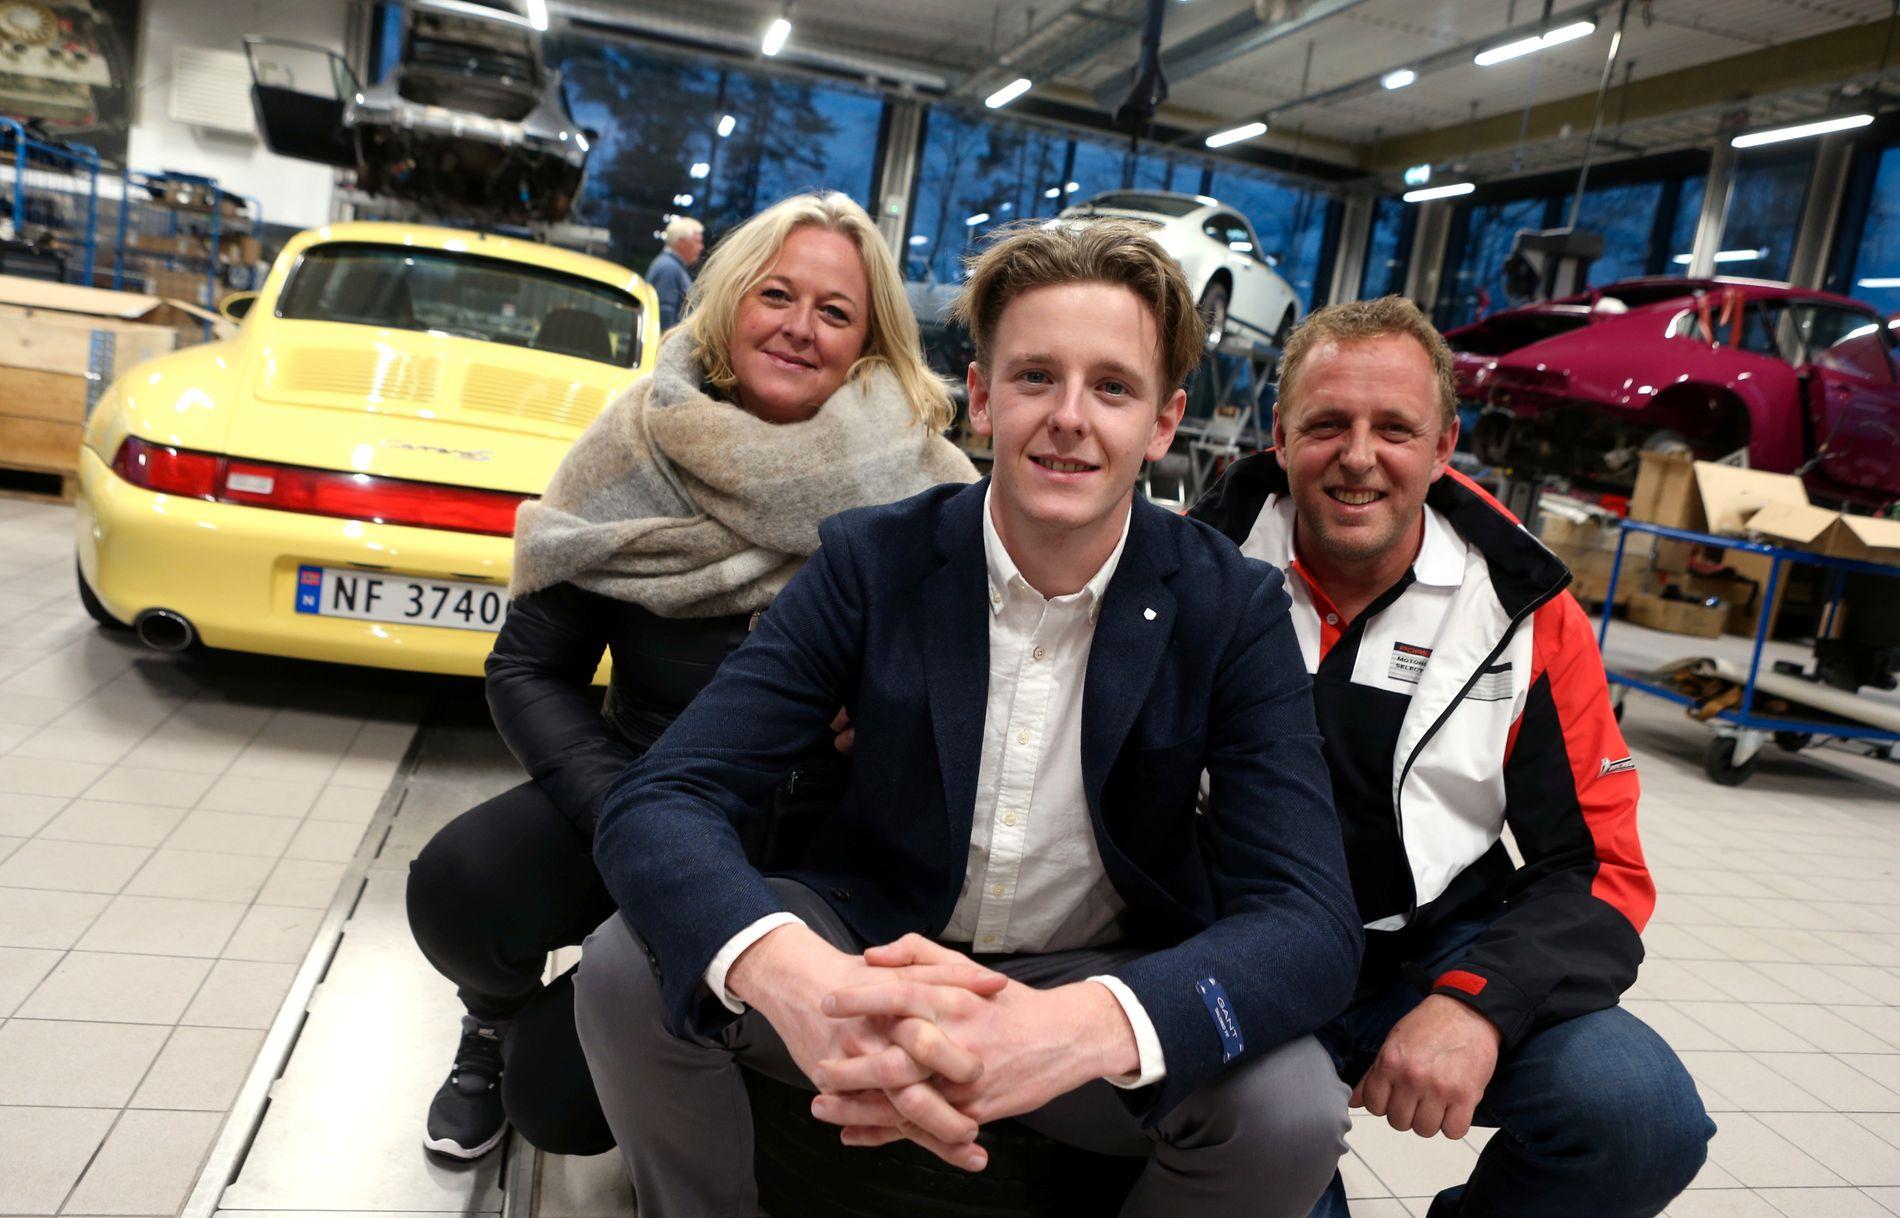 GOD STØTTE: Dennis Olsen med mamma Elisabeth og pappa Roy Espen. Og bak er det selvfølgelig mange Porscher ...